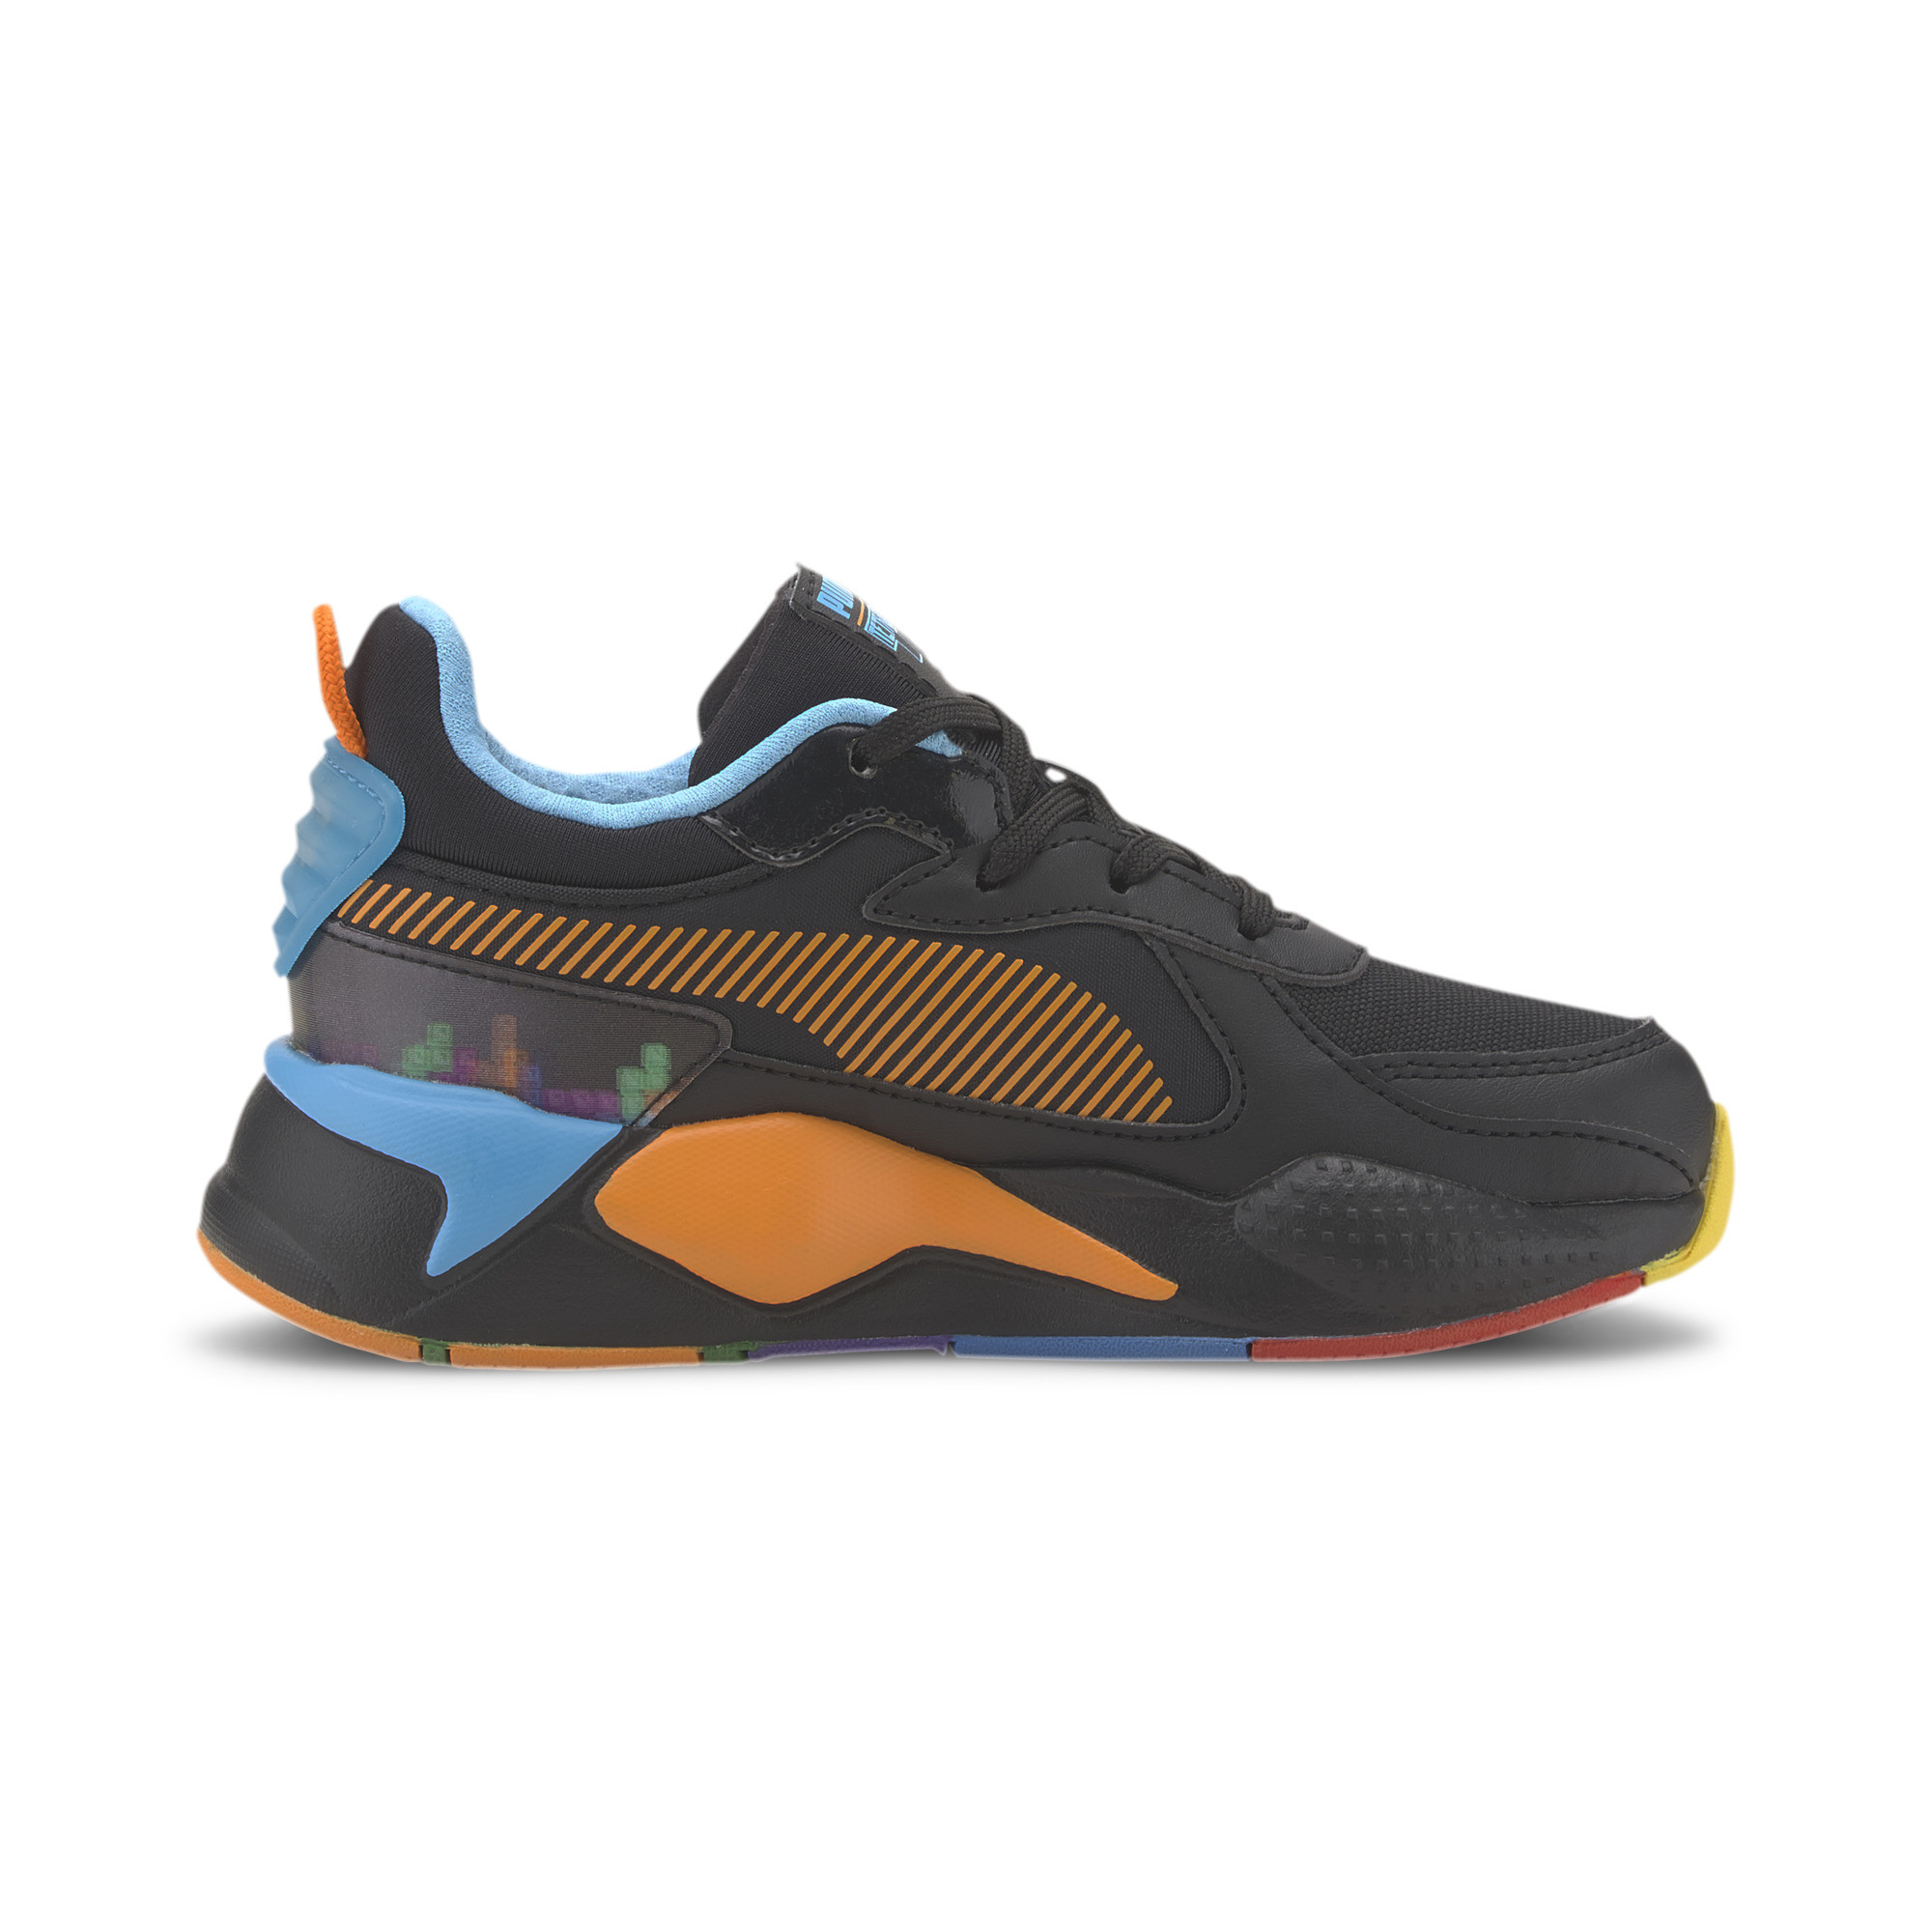 PUMA-PUMA-x-TETRIS-RS-X-Little-Kids-039-Shoes-Kids-Shoe-Kids thumbnail 6